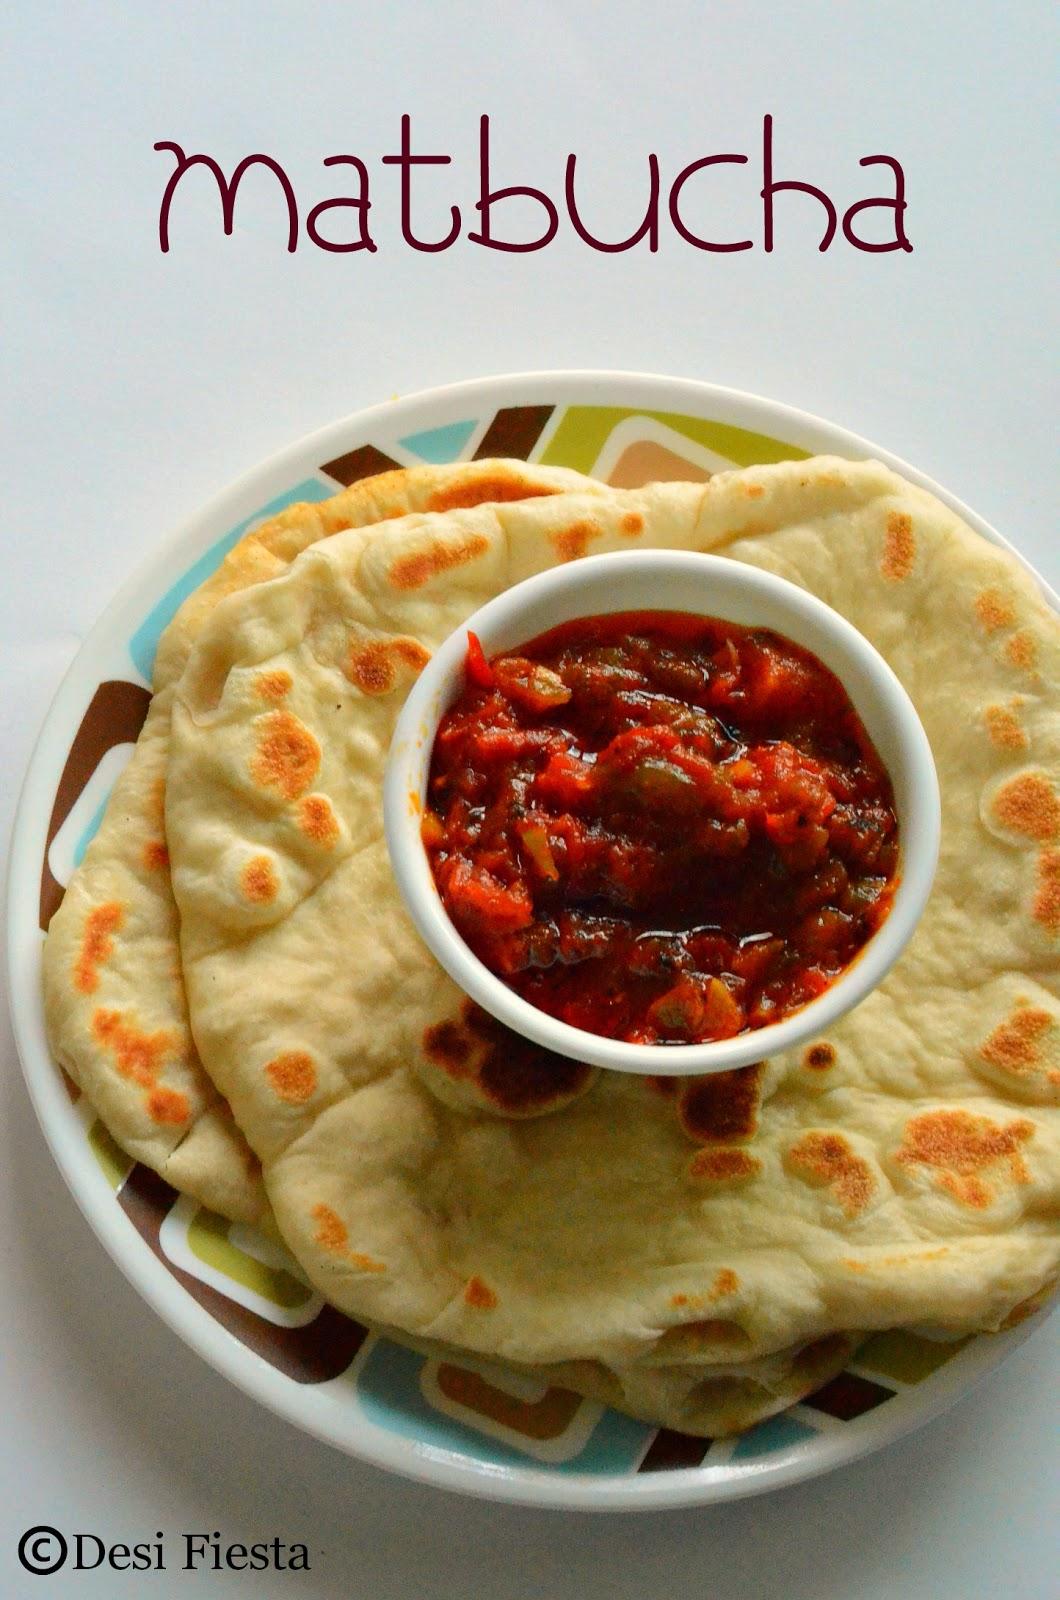 Desi Fiesta : Sufganiyot ( Doughnut jelly) Recipe|Laffa Bread|Matbucha ...